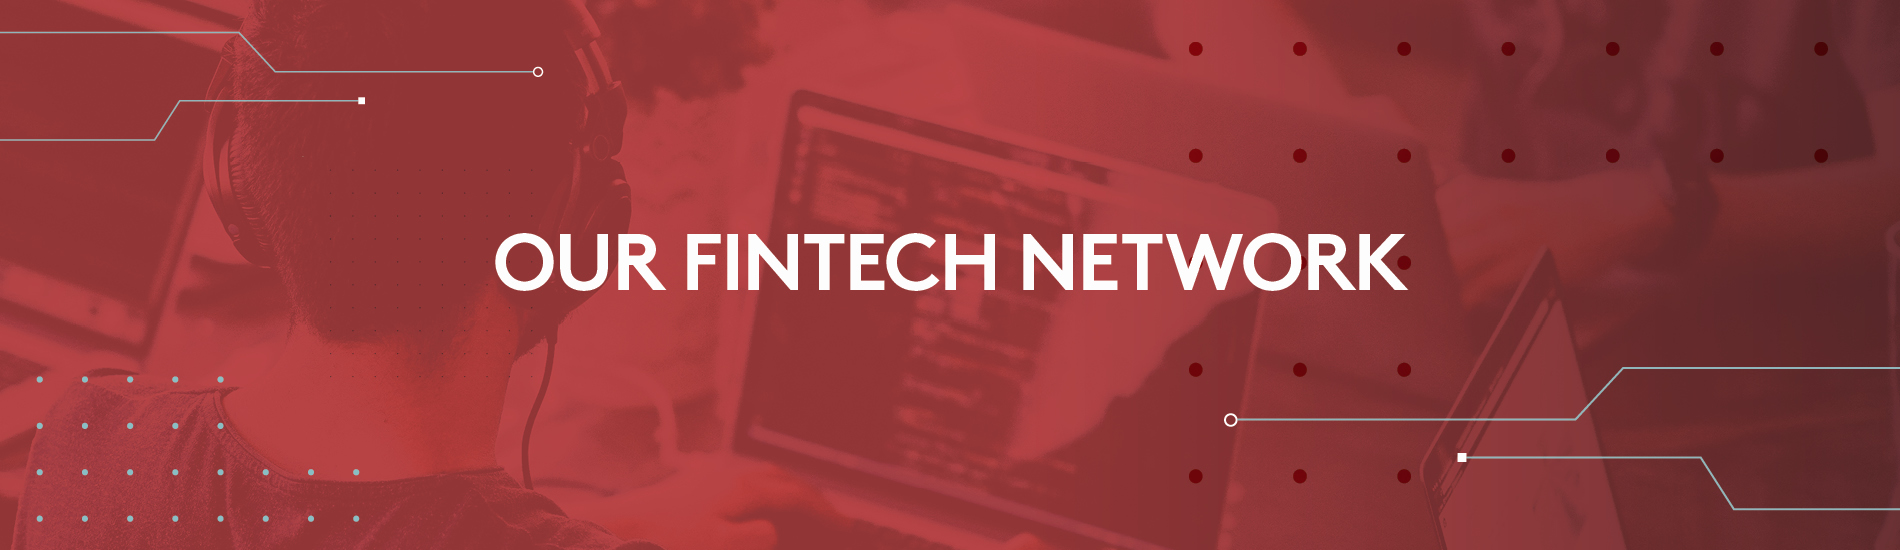 Cornell SC Johnson College Fintech Network Banner Image